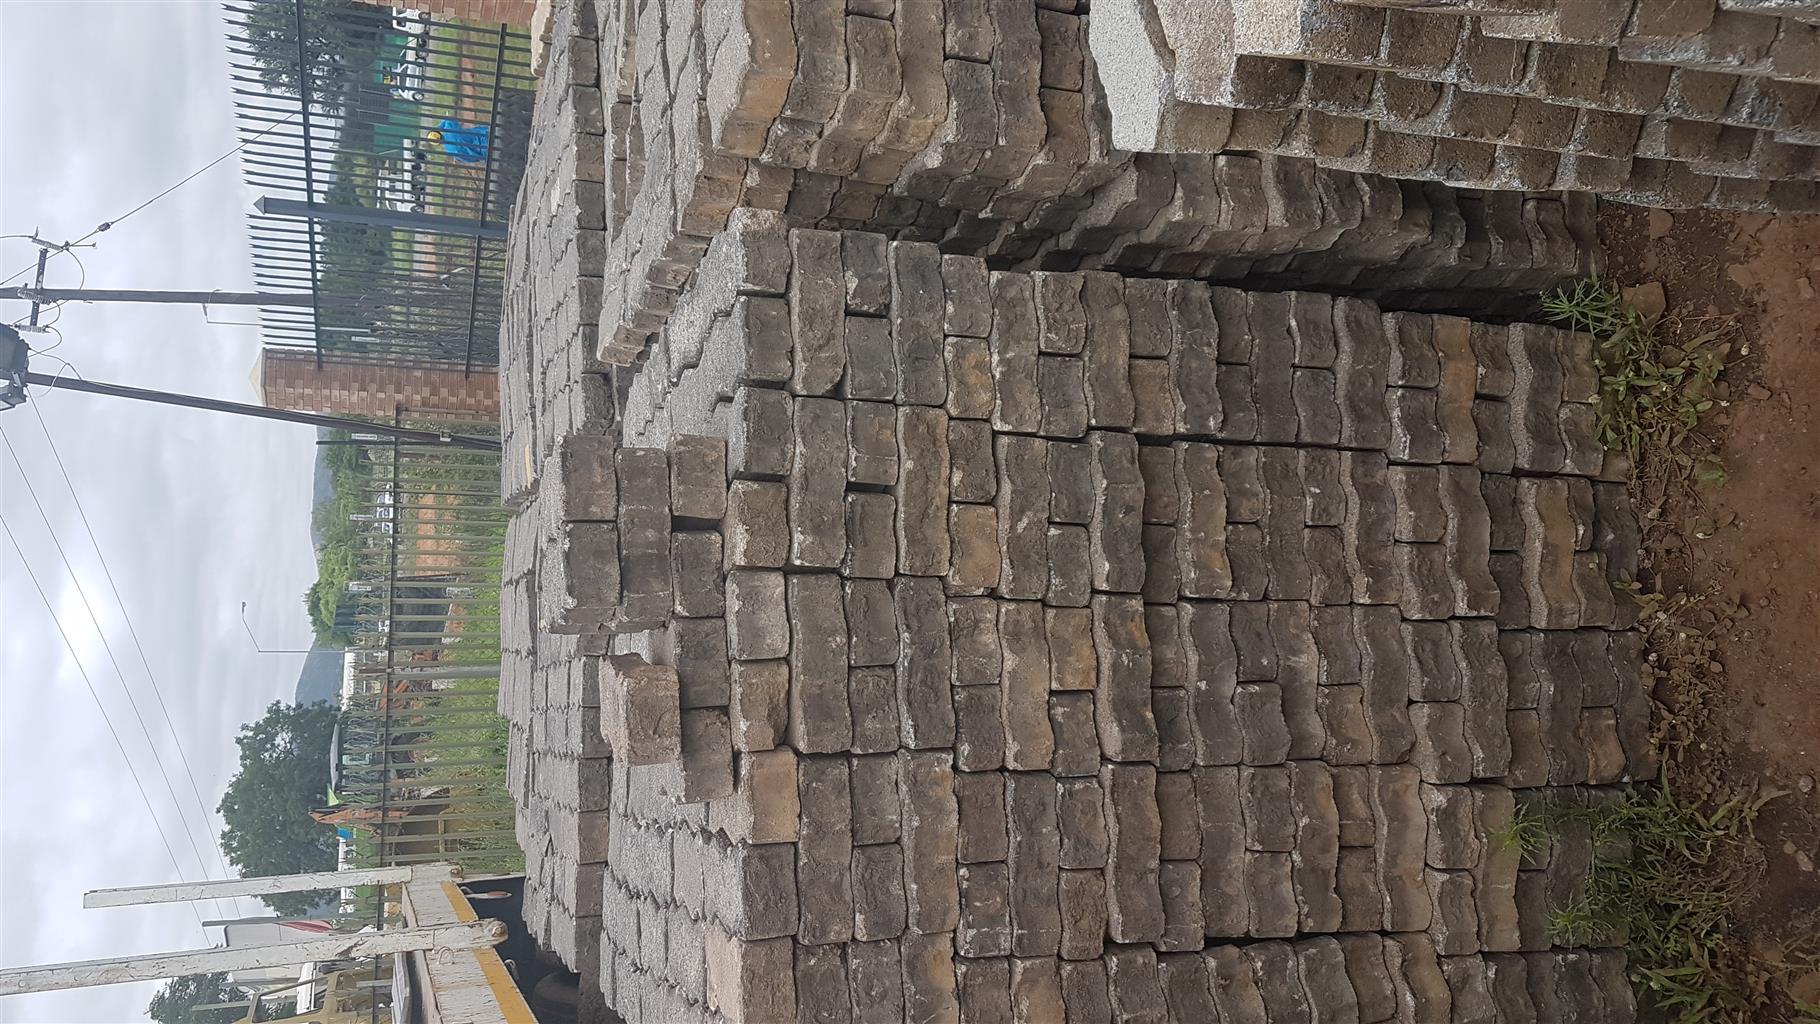 Interlockers paving bricks second hand for sale